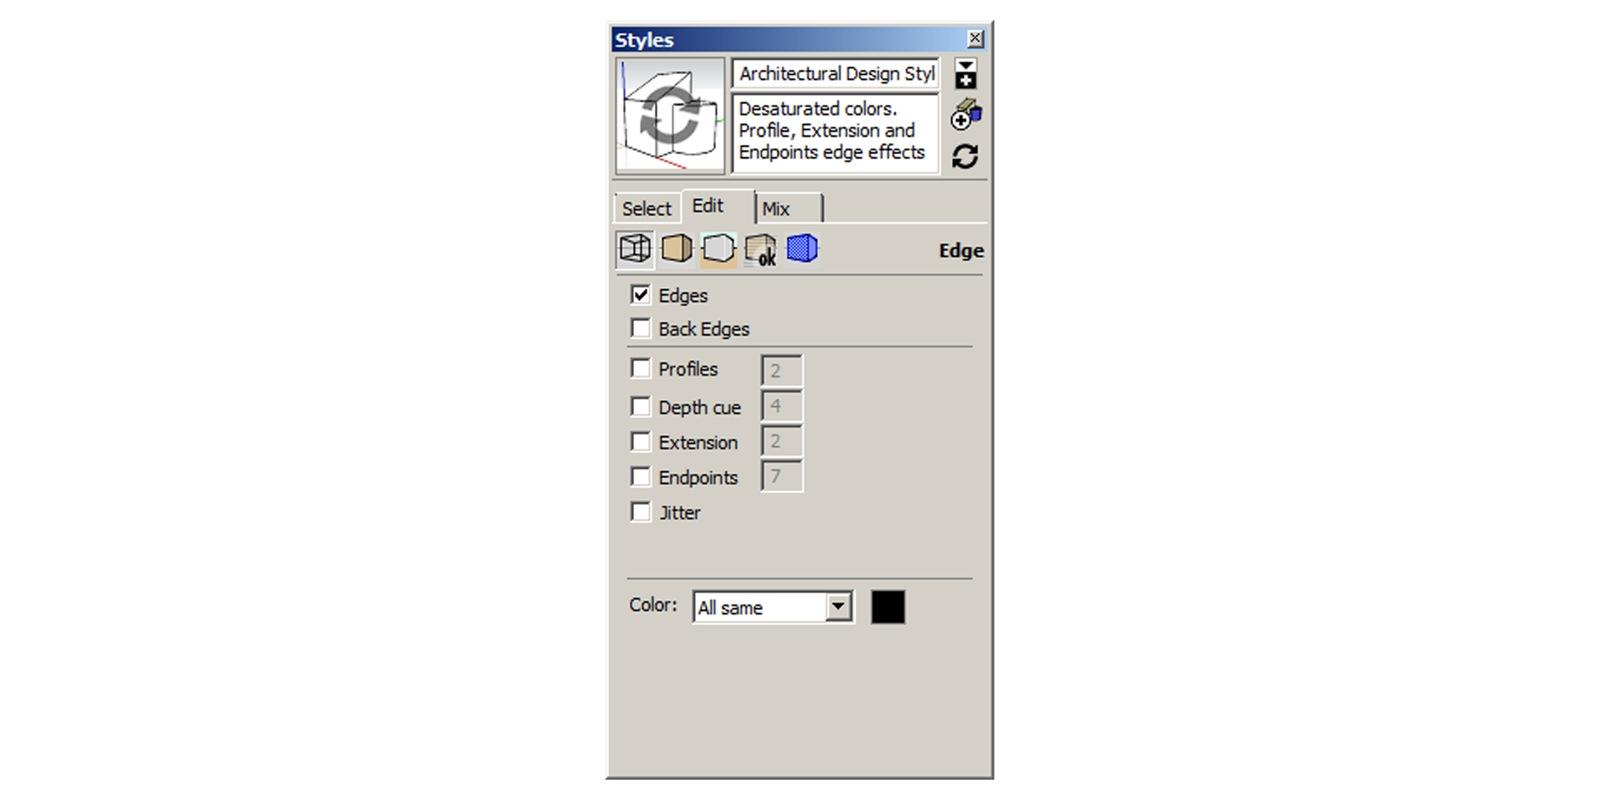 2014-01-14_blog_image_sketchup_edges.jpg